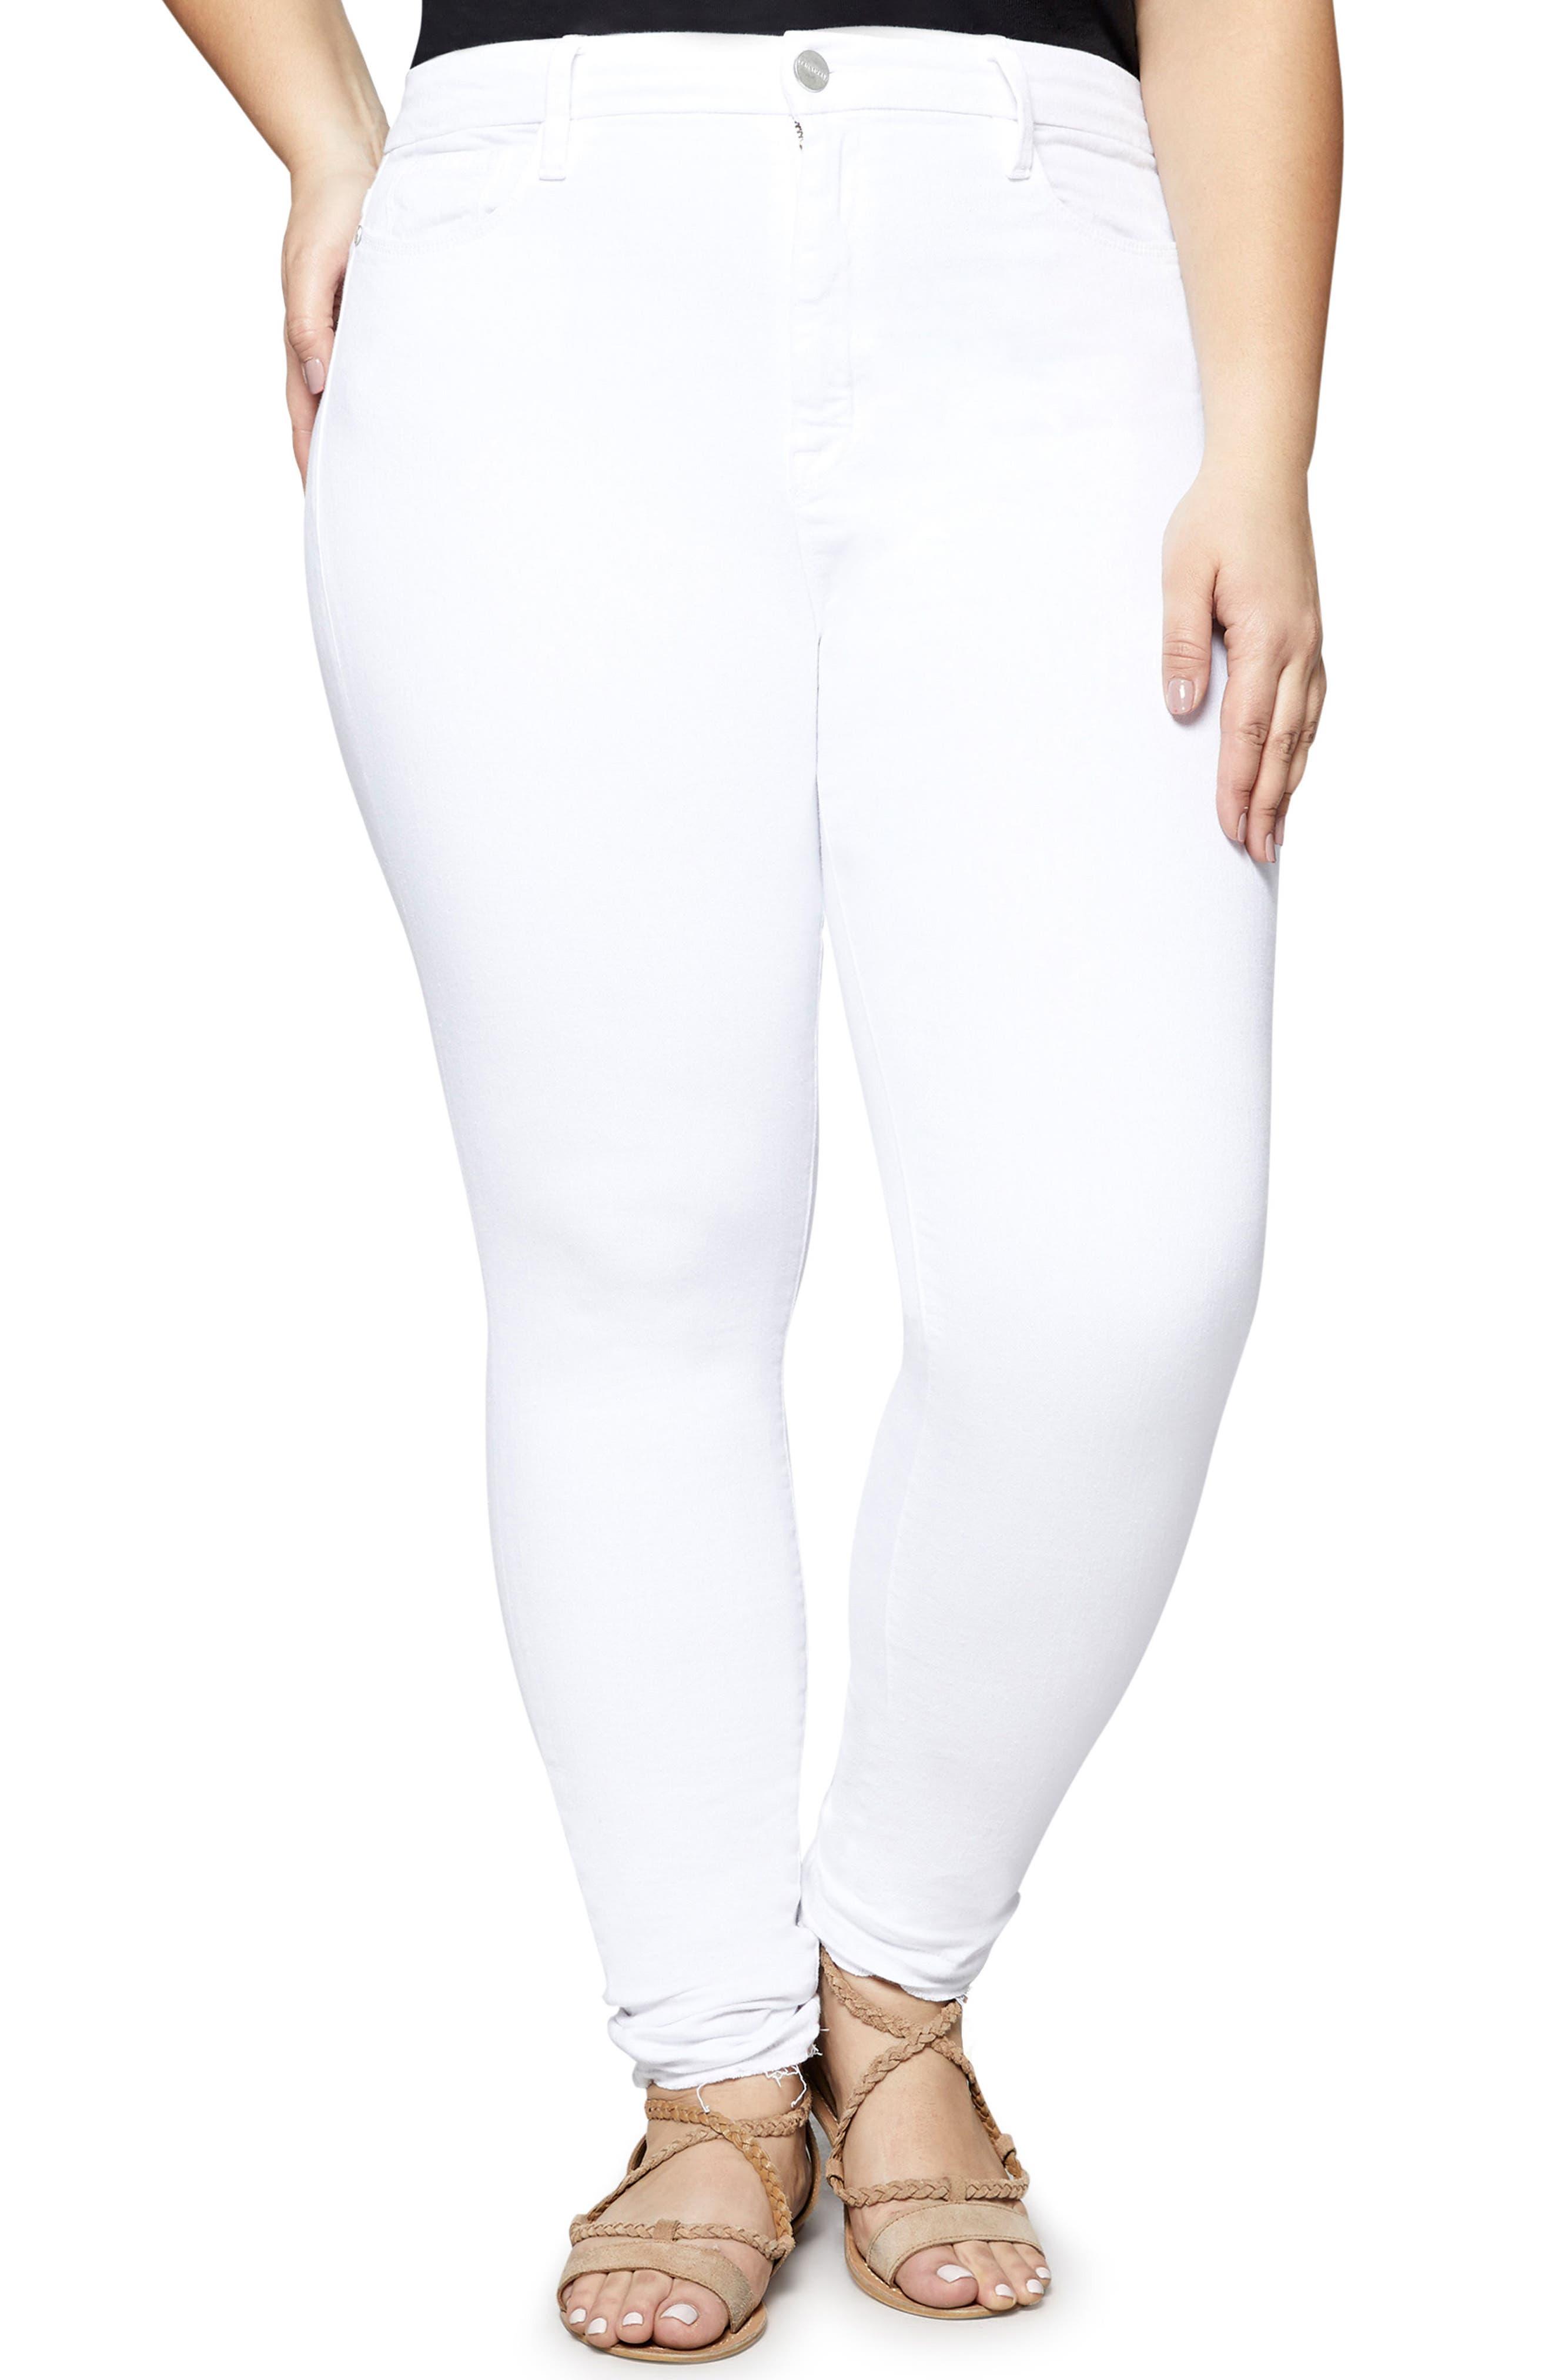 Saige Skinny Jeans,                             Main thumbnail 1, color,                             White